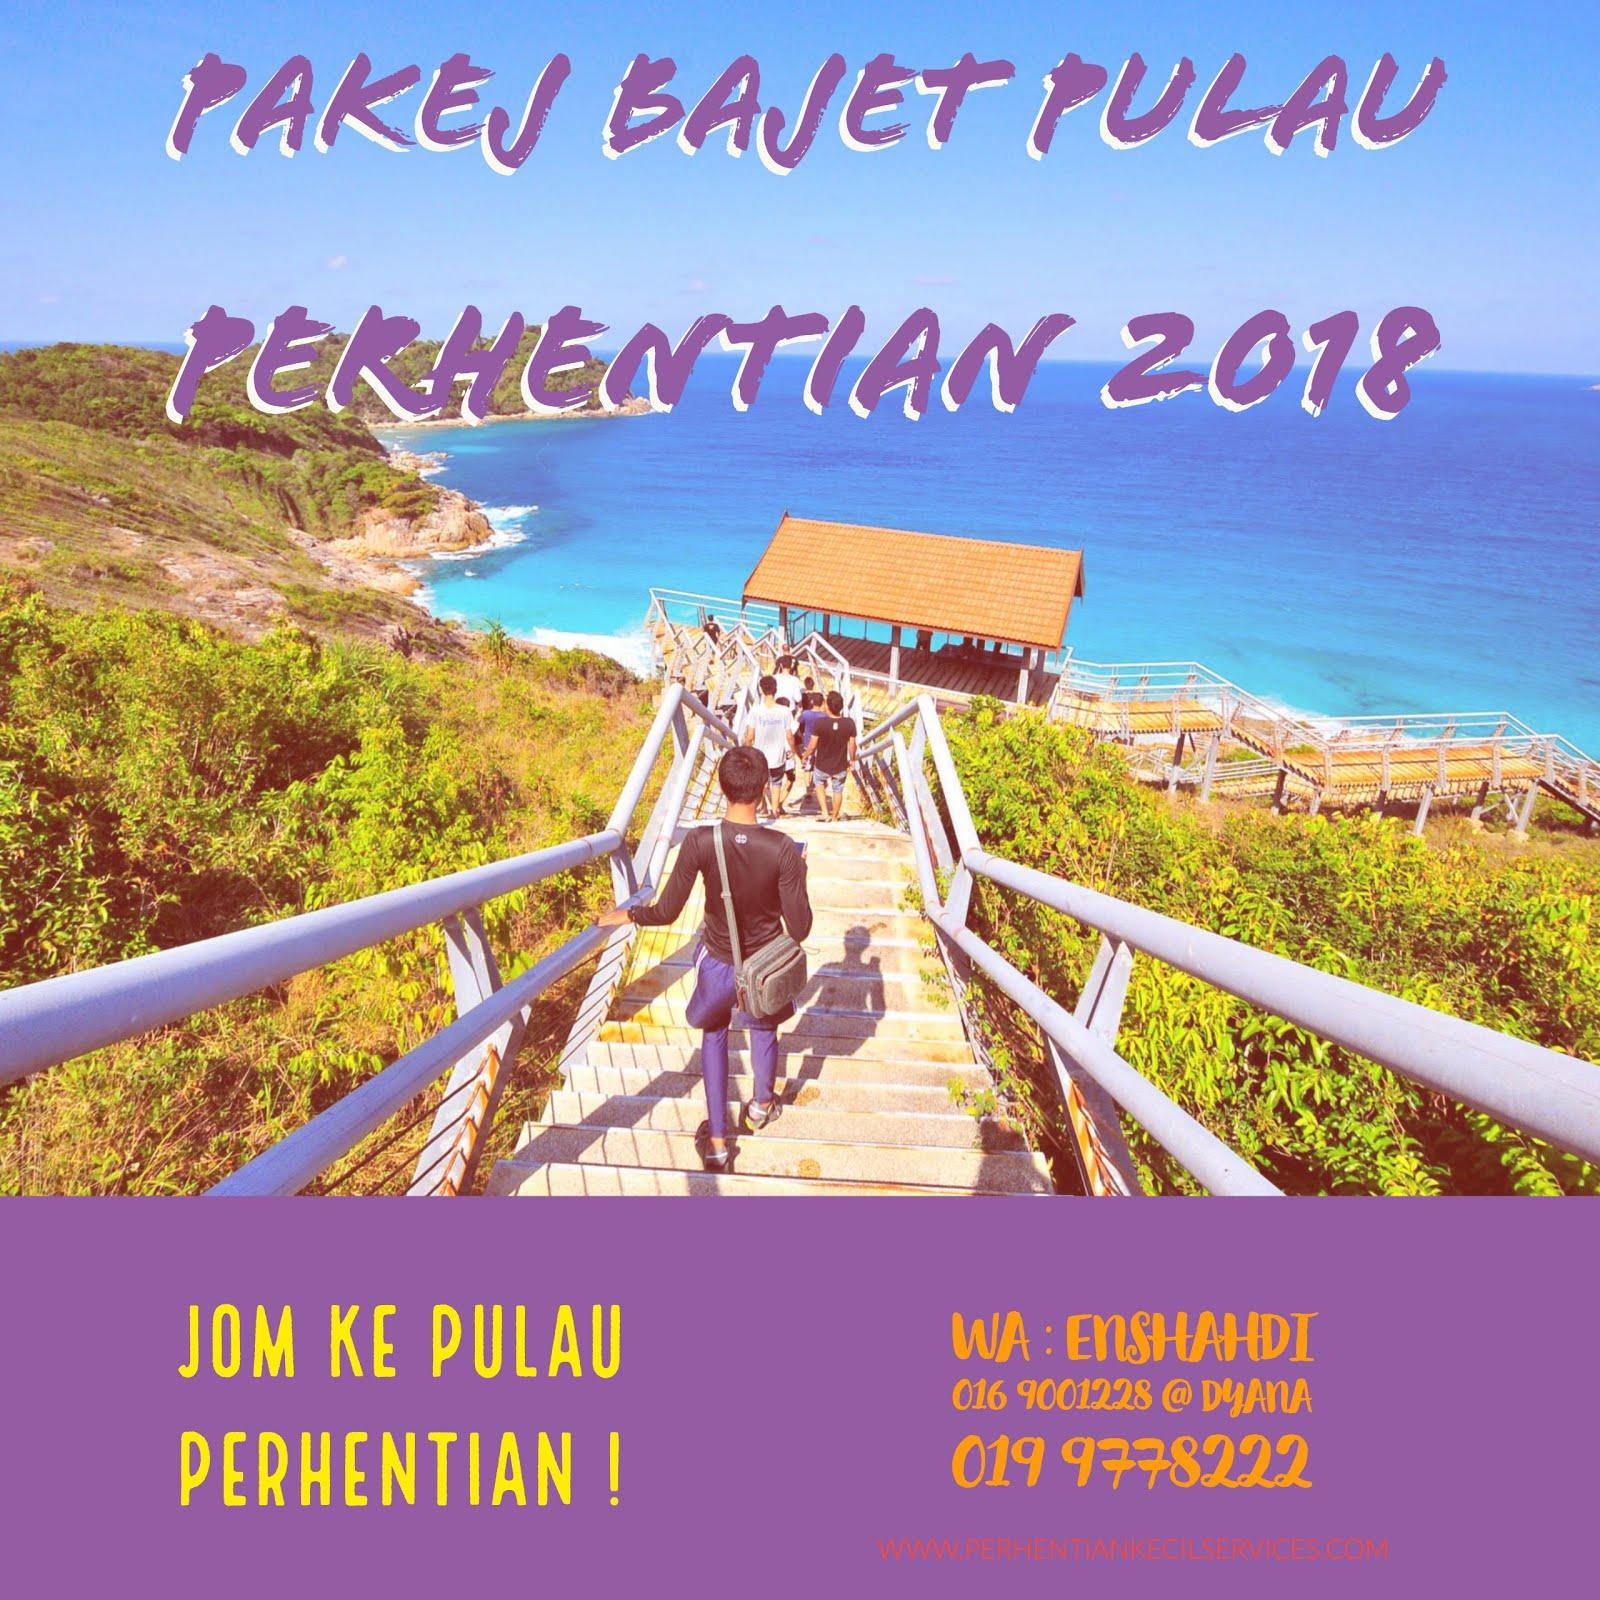 PAKEJ BAJET PULAU PERHENTIAN 2018